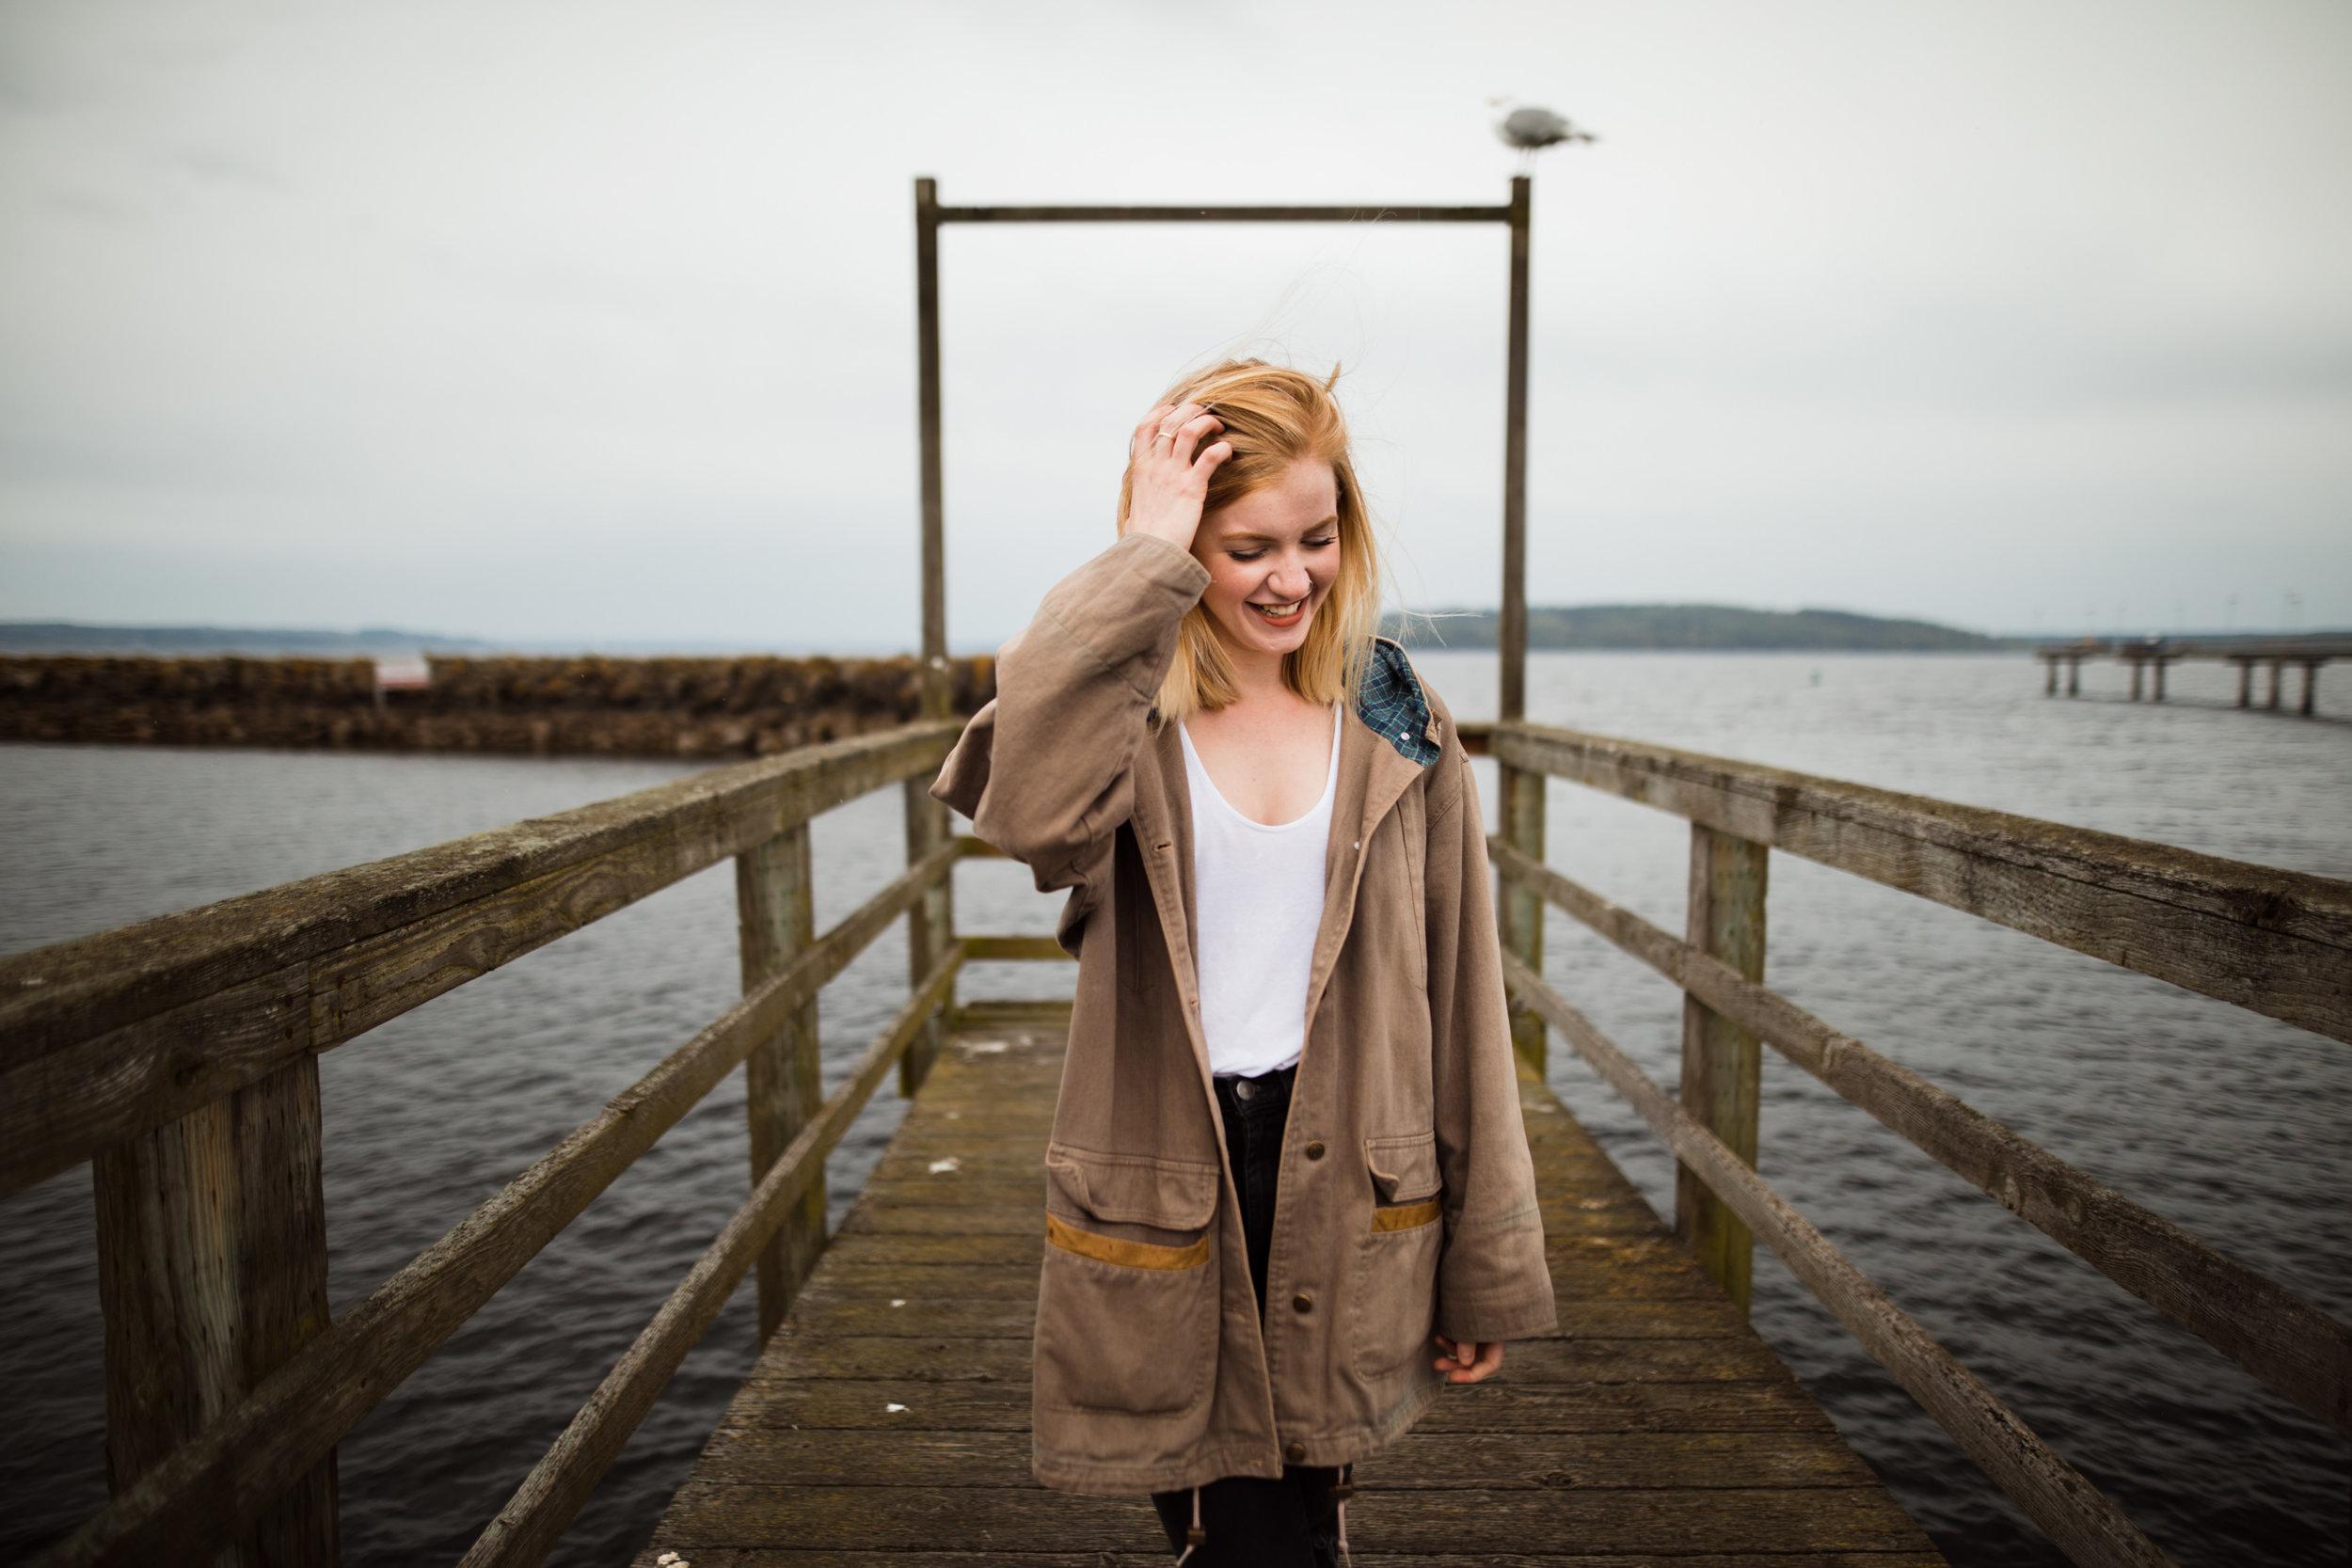 4-22-2017 Aimee Tomlinson Portraits - 3.jpg